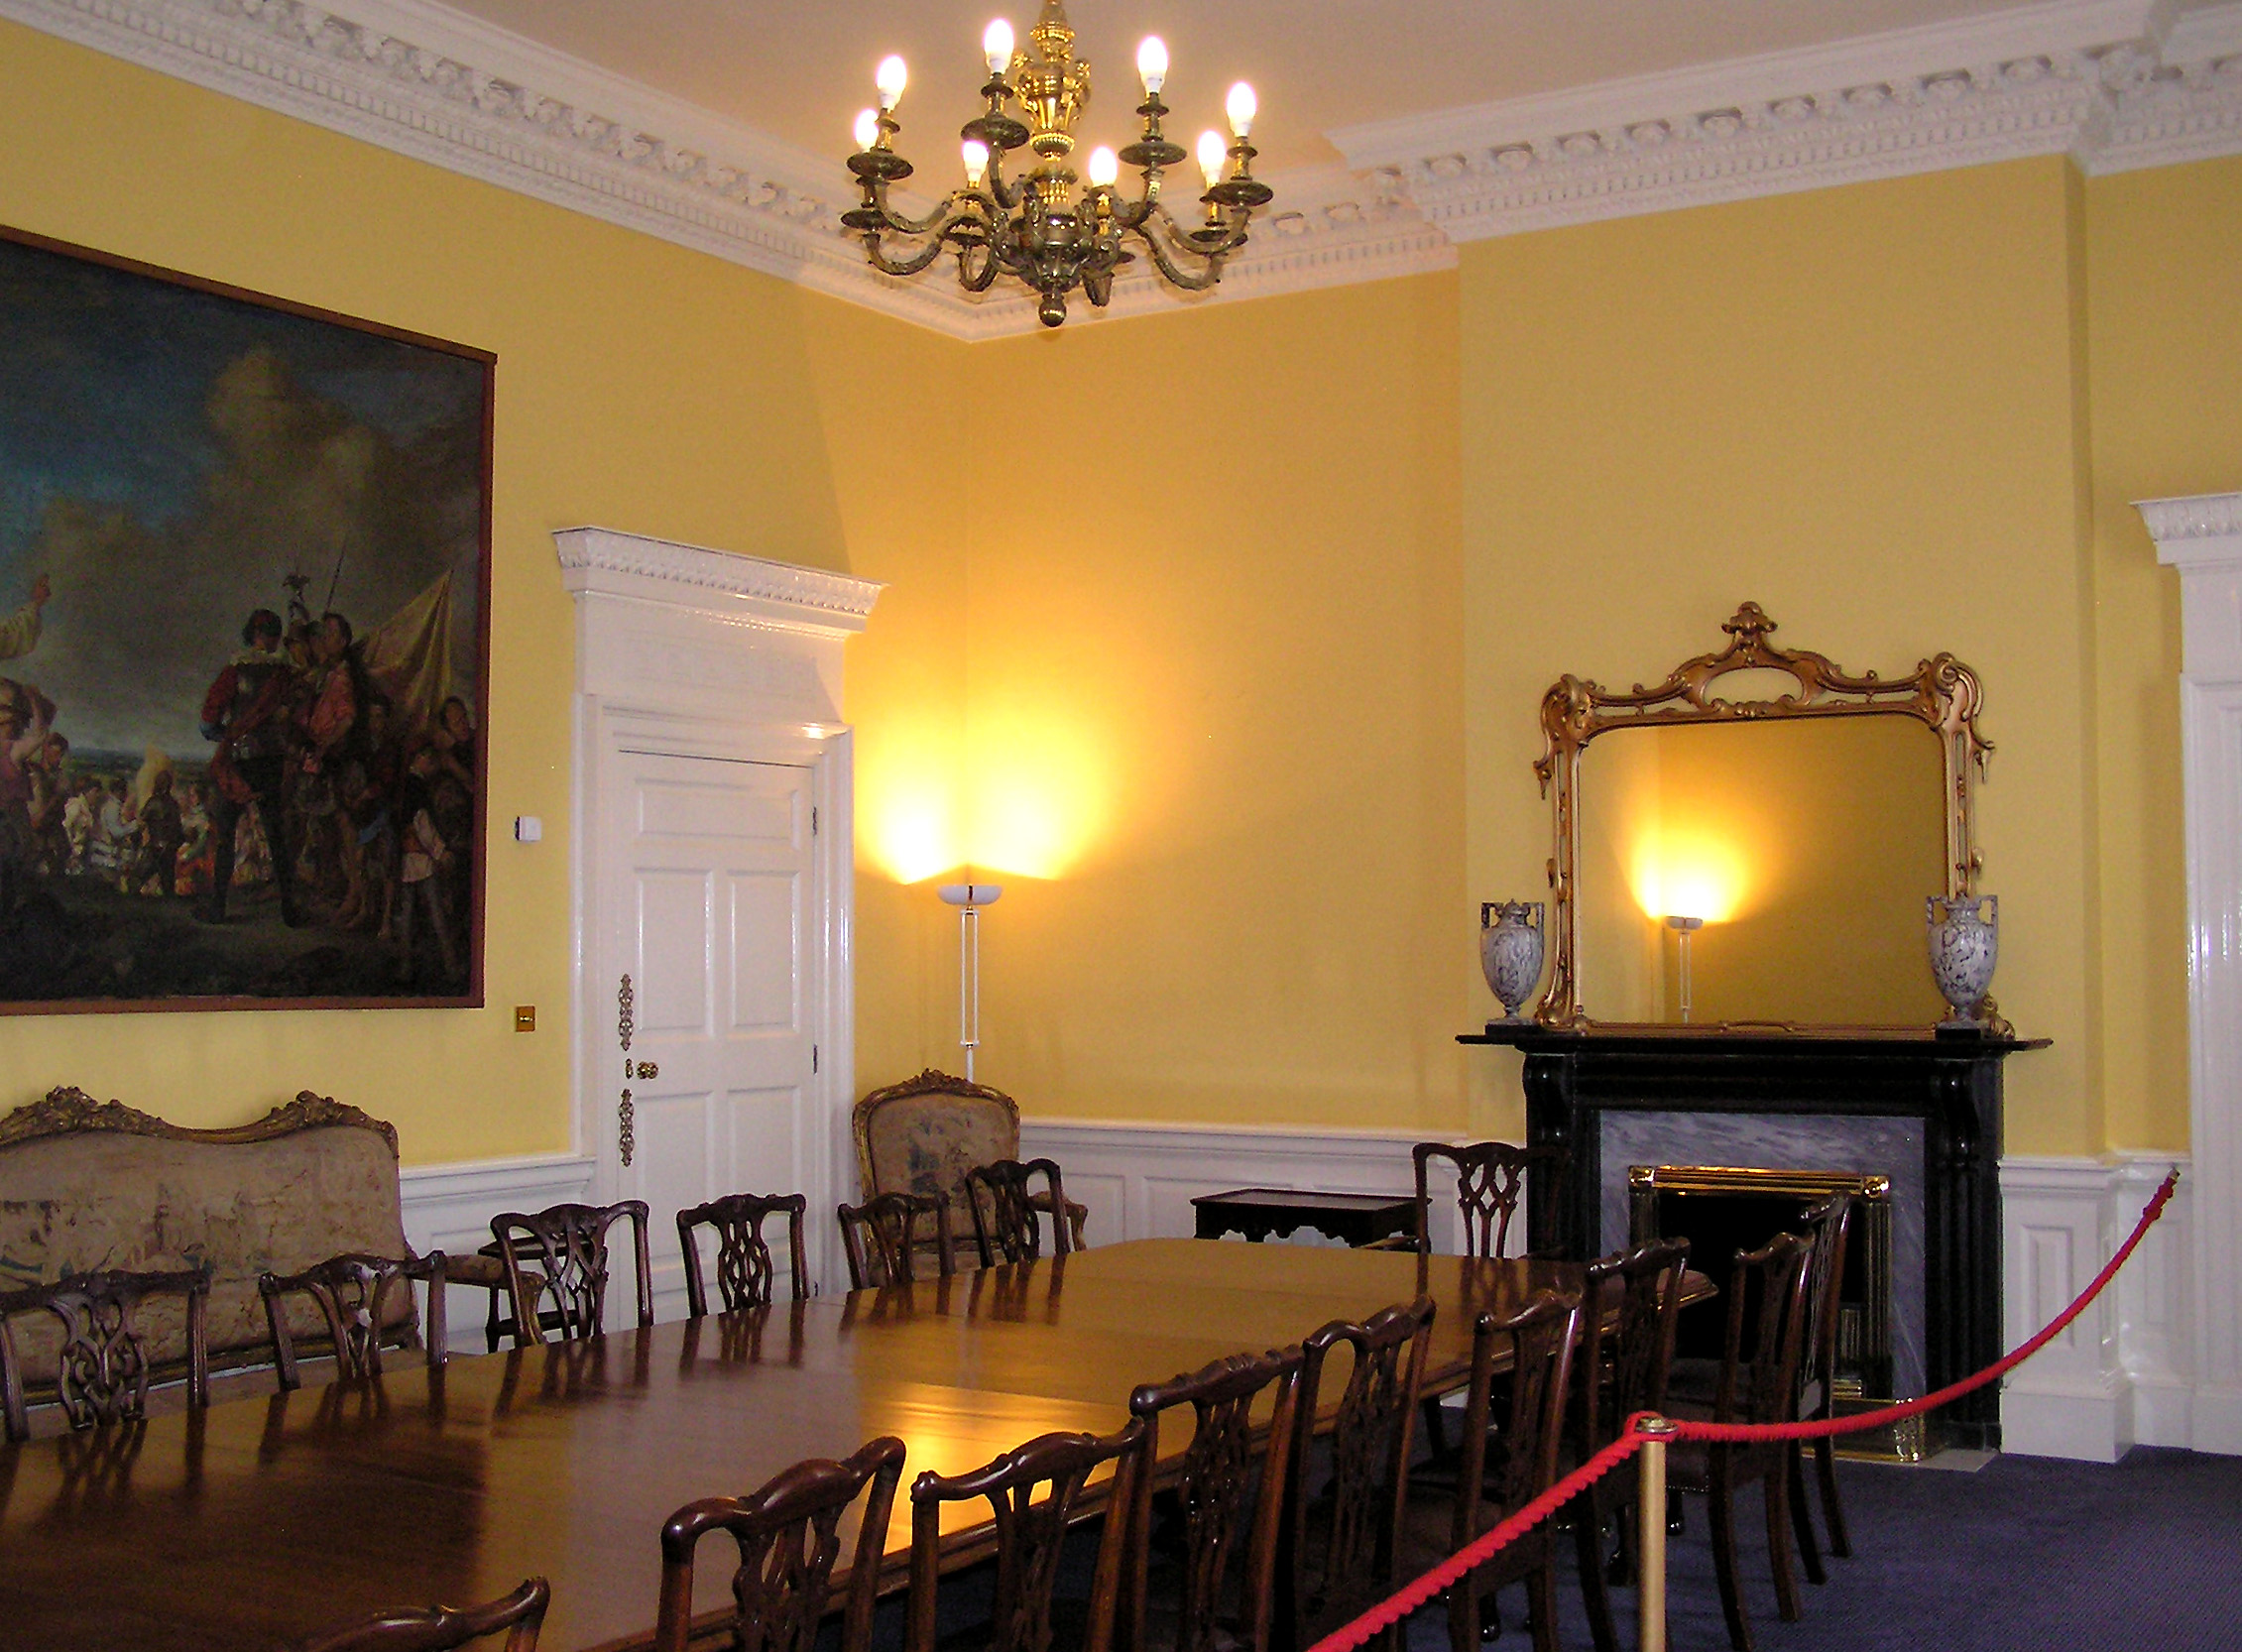 file:(ireland) dublin castle interior (yellow room) 01